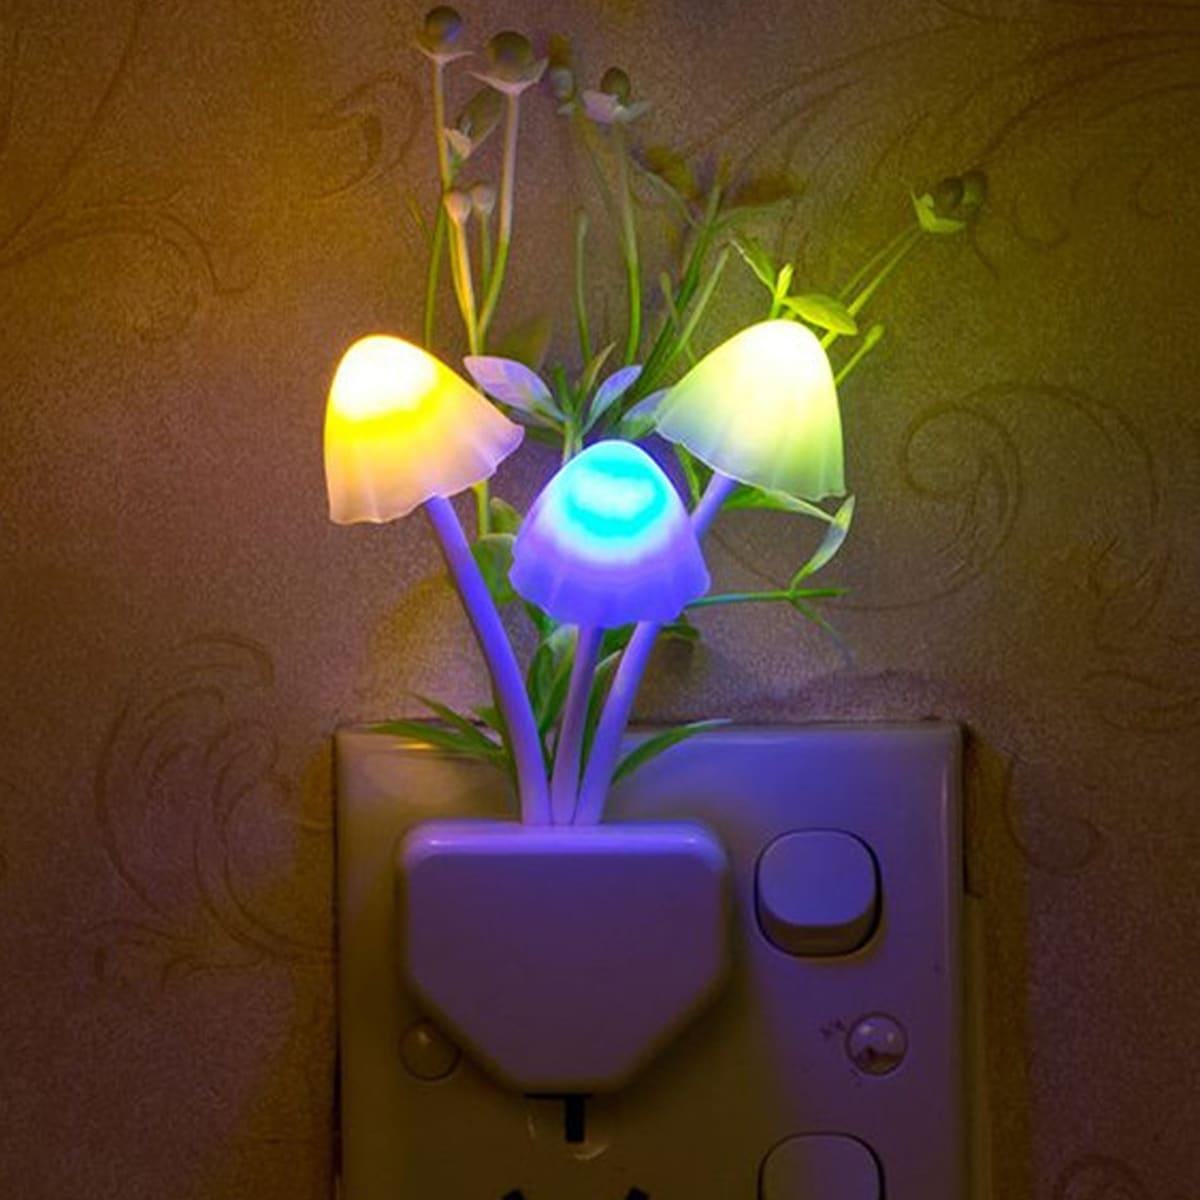 1 st Random Paddestoel & Bloem Ontwerp Nachtlampje